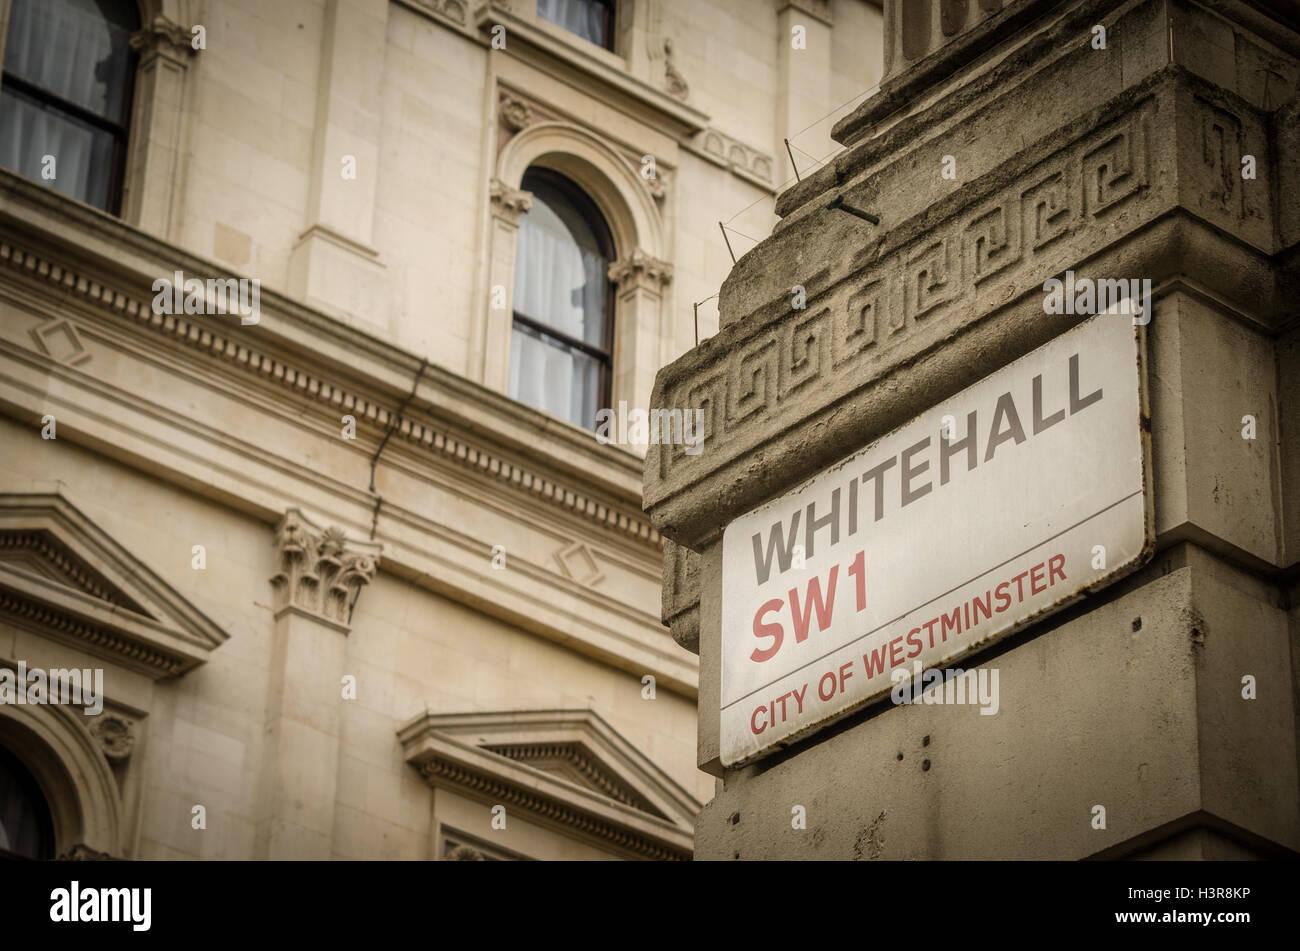 Whitehall SW1 street sign. - Stock Image